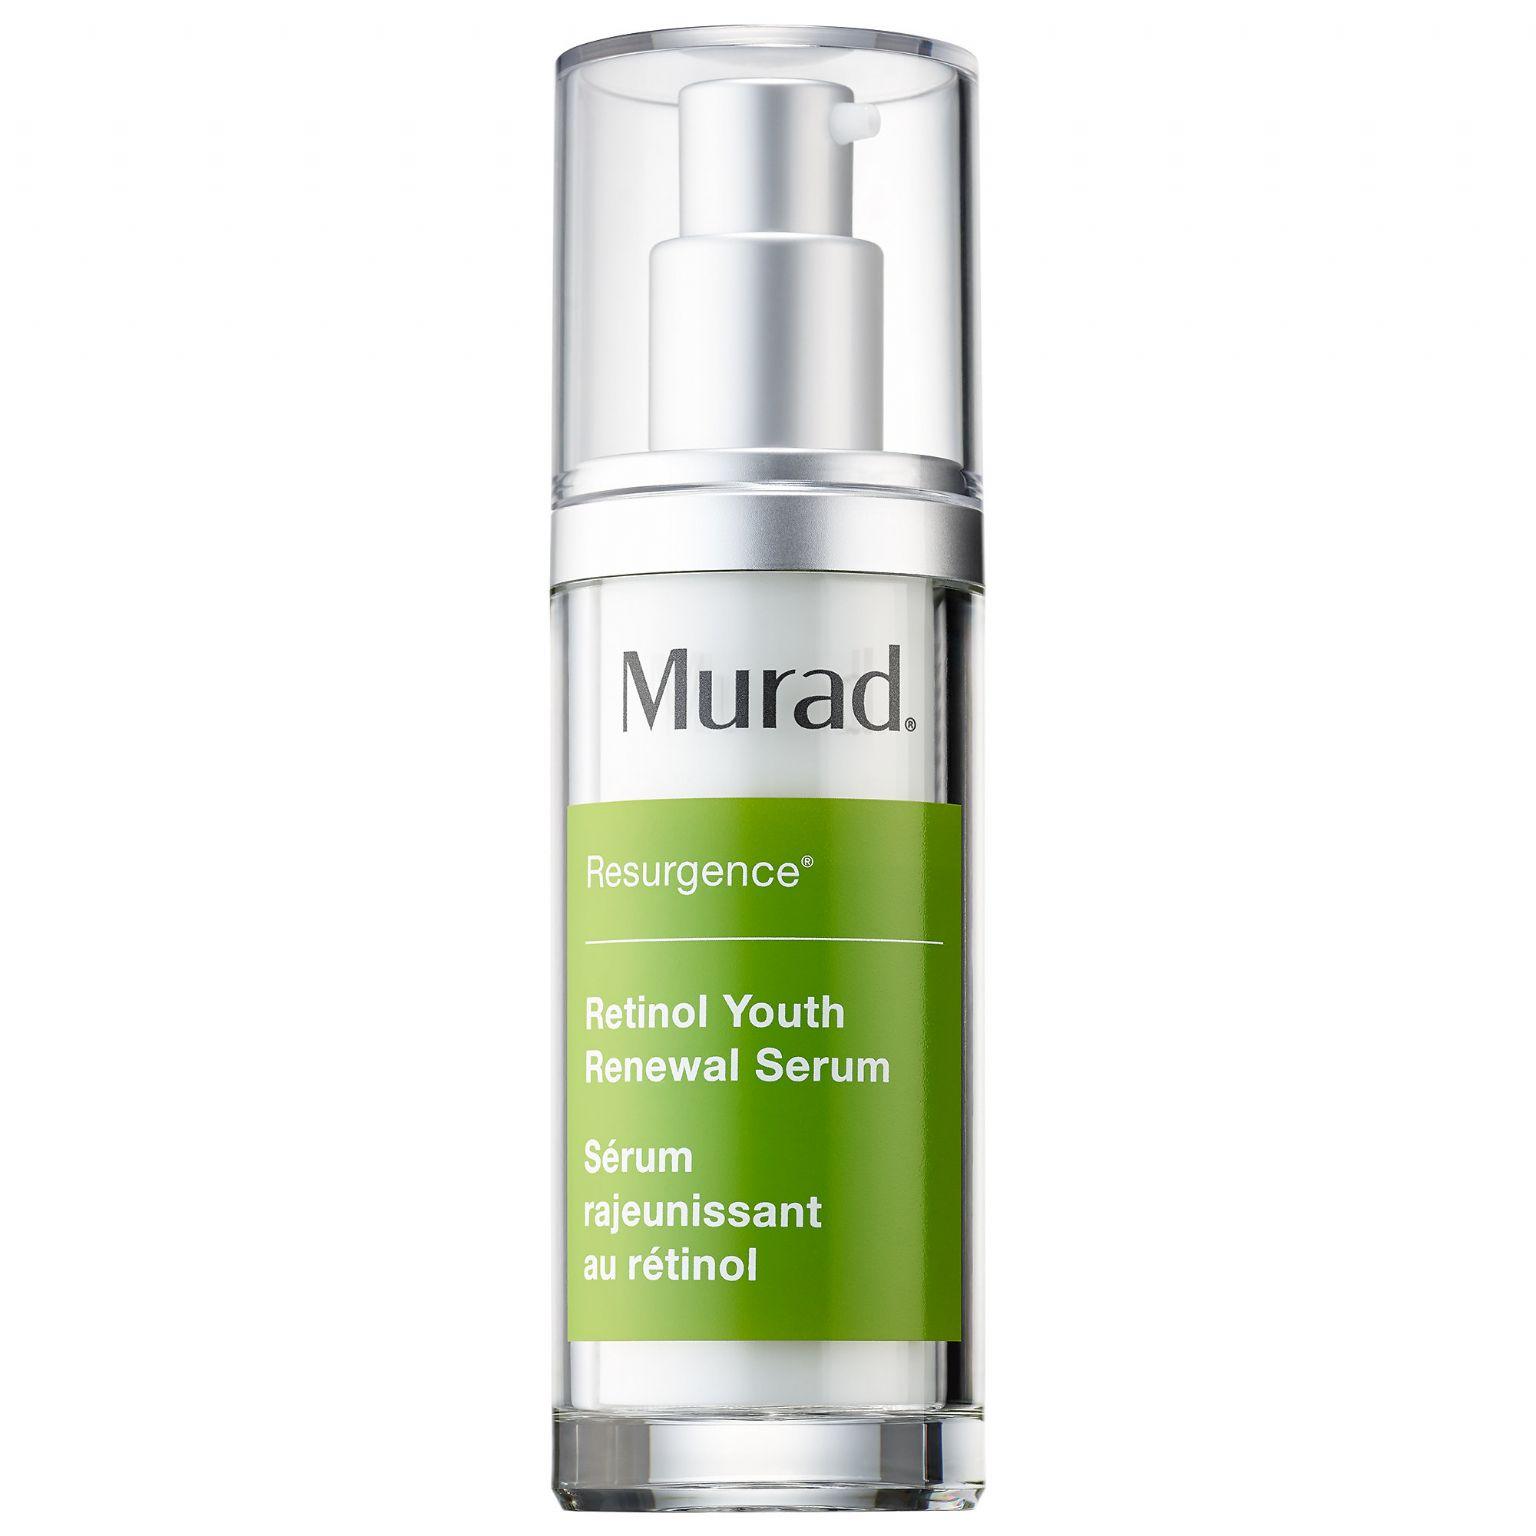 Murad Retinol Youth Renewal Serum reviews, photos